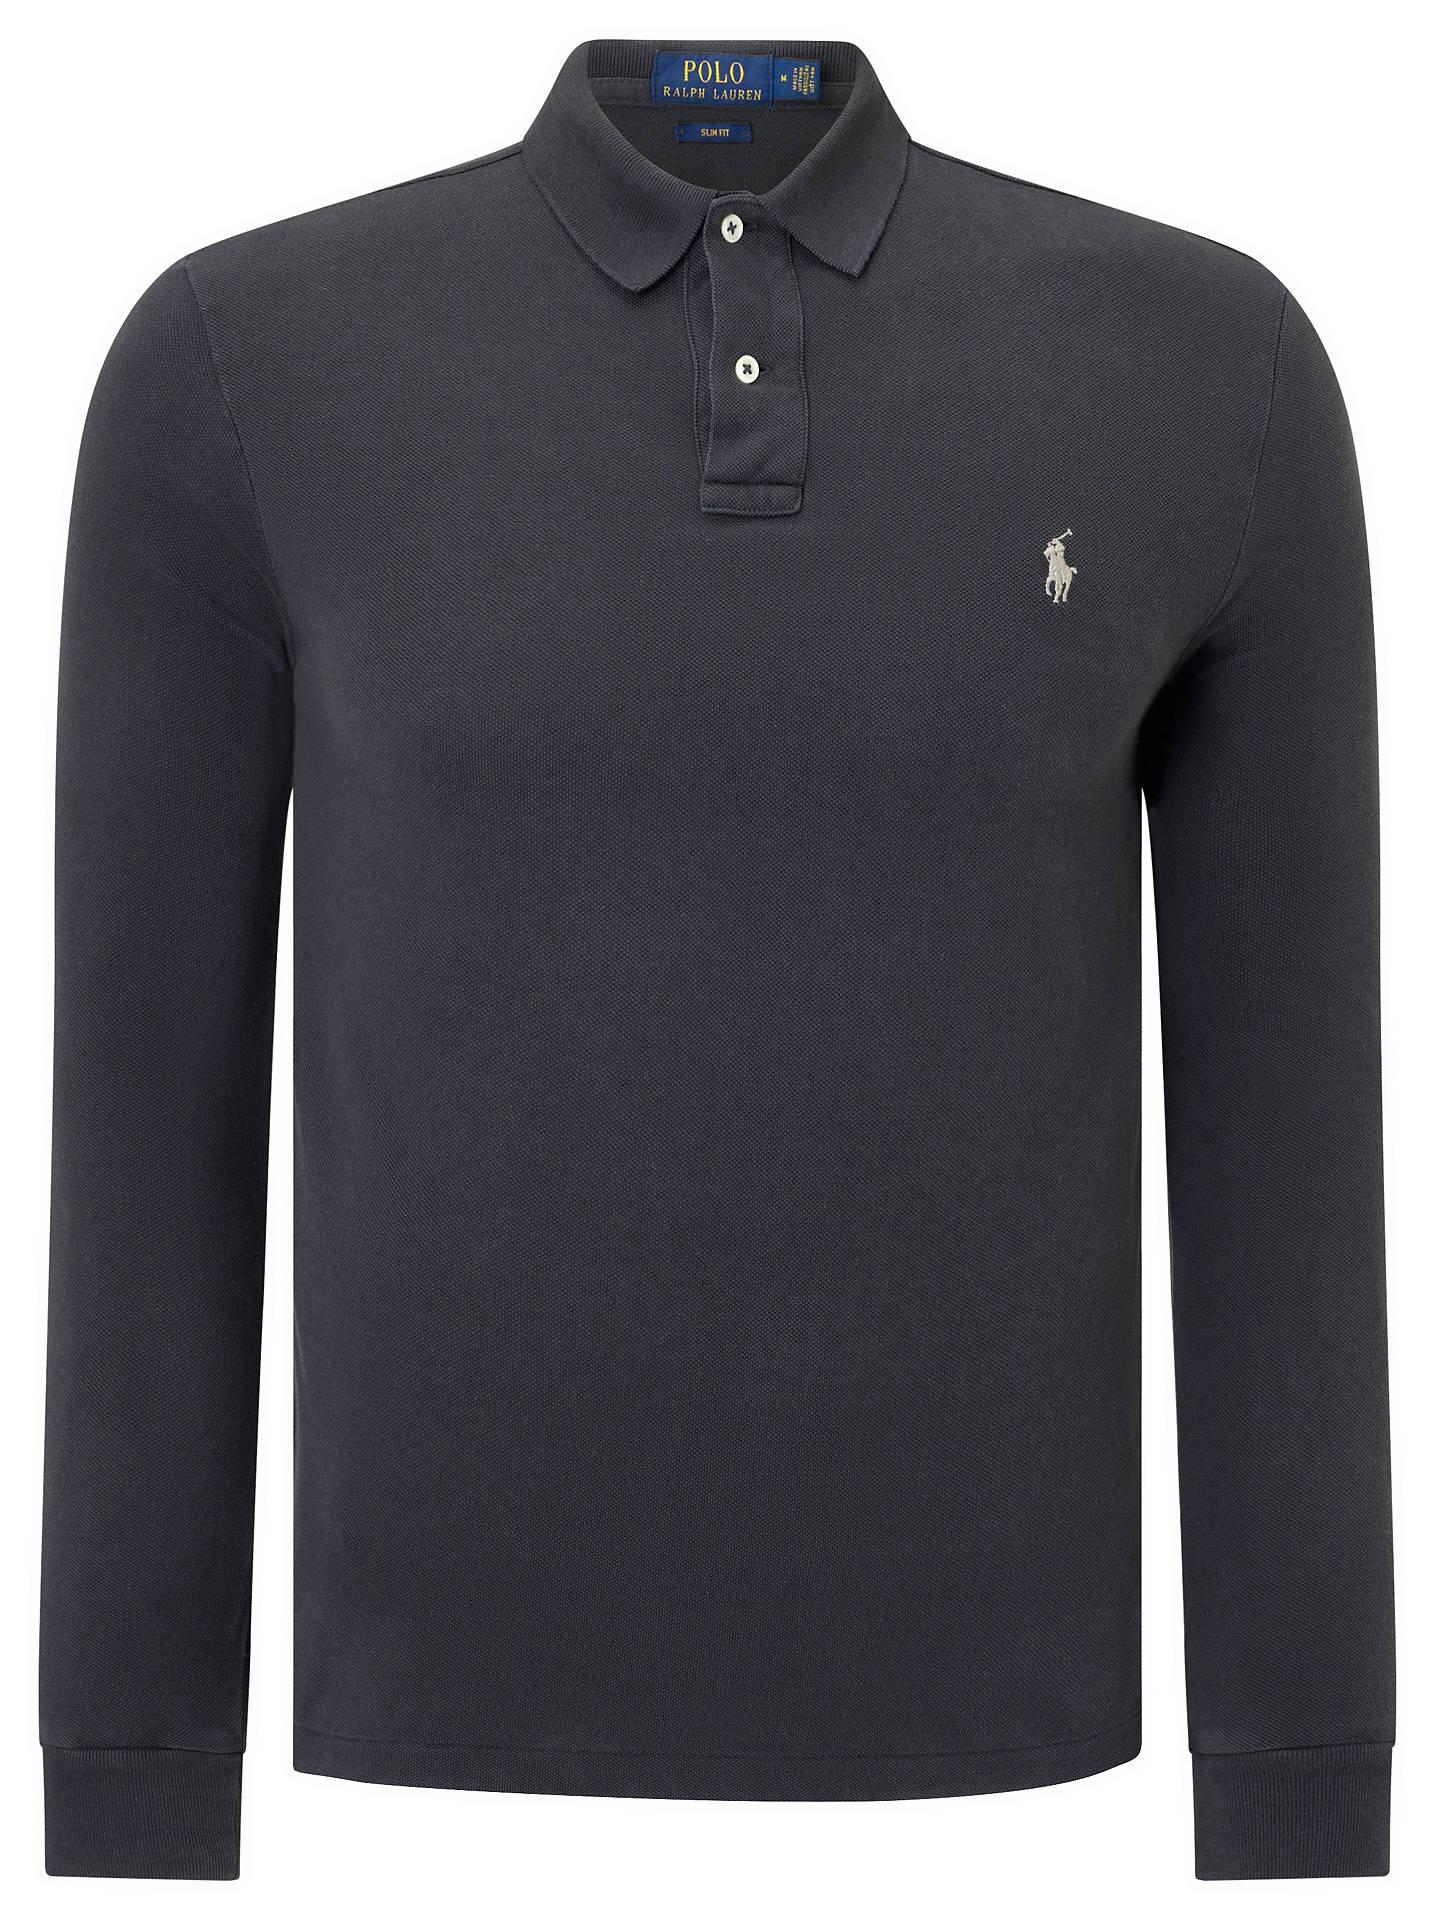 e26279f0 Polo Ralph Lauren Long Sleeve Polo Shirt, Dark Carbon Grey at John ...